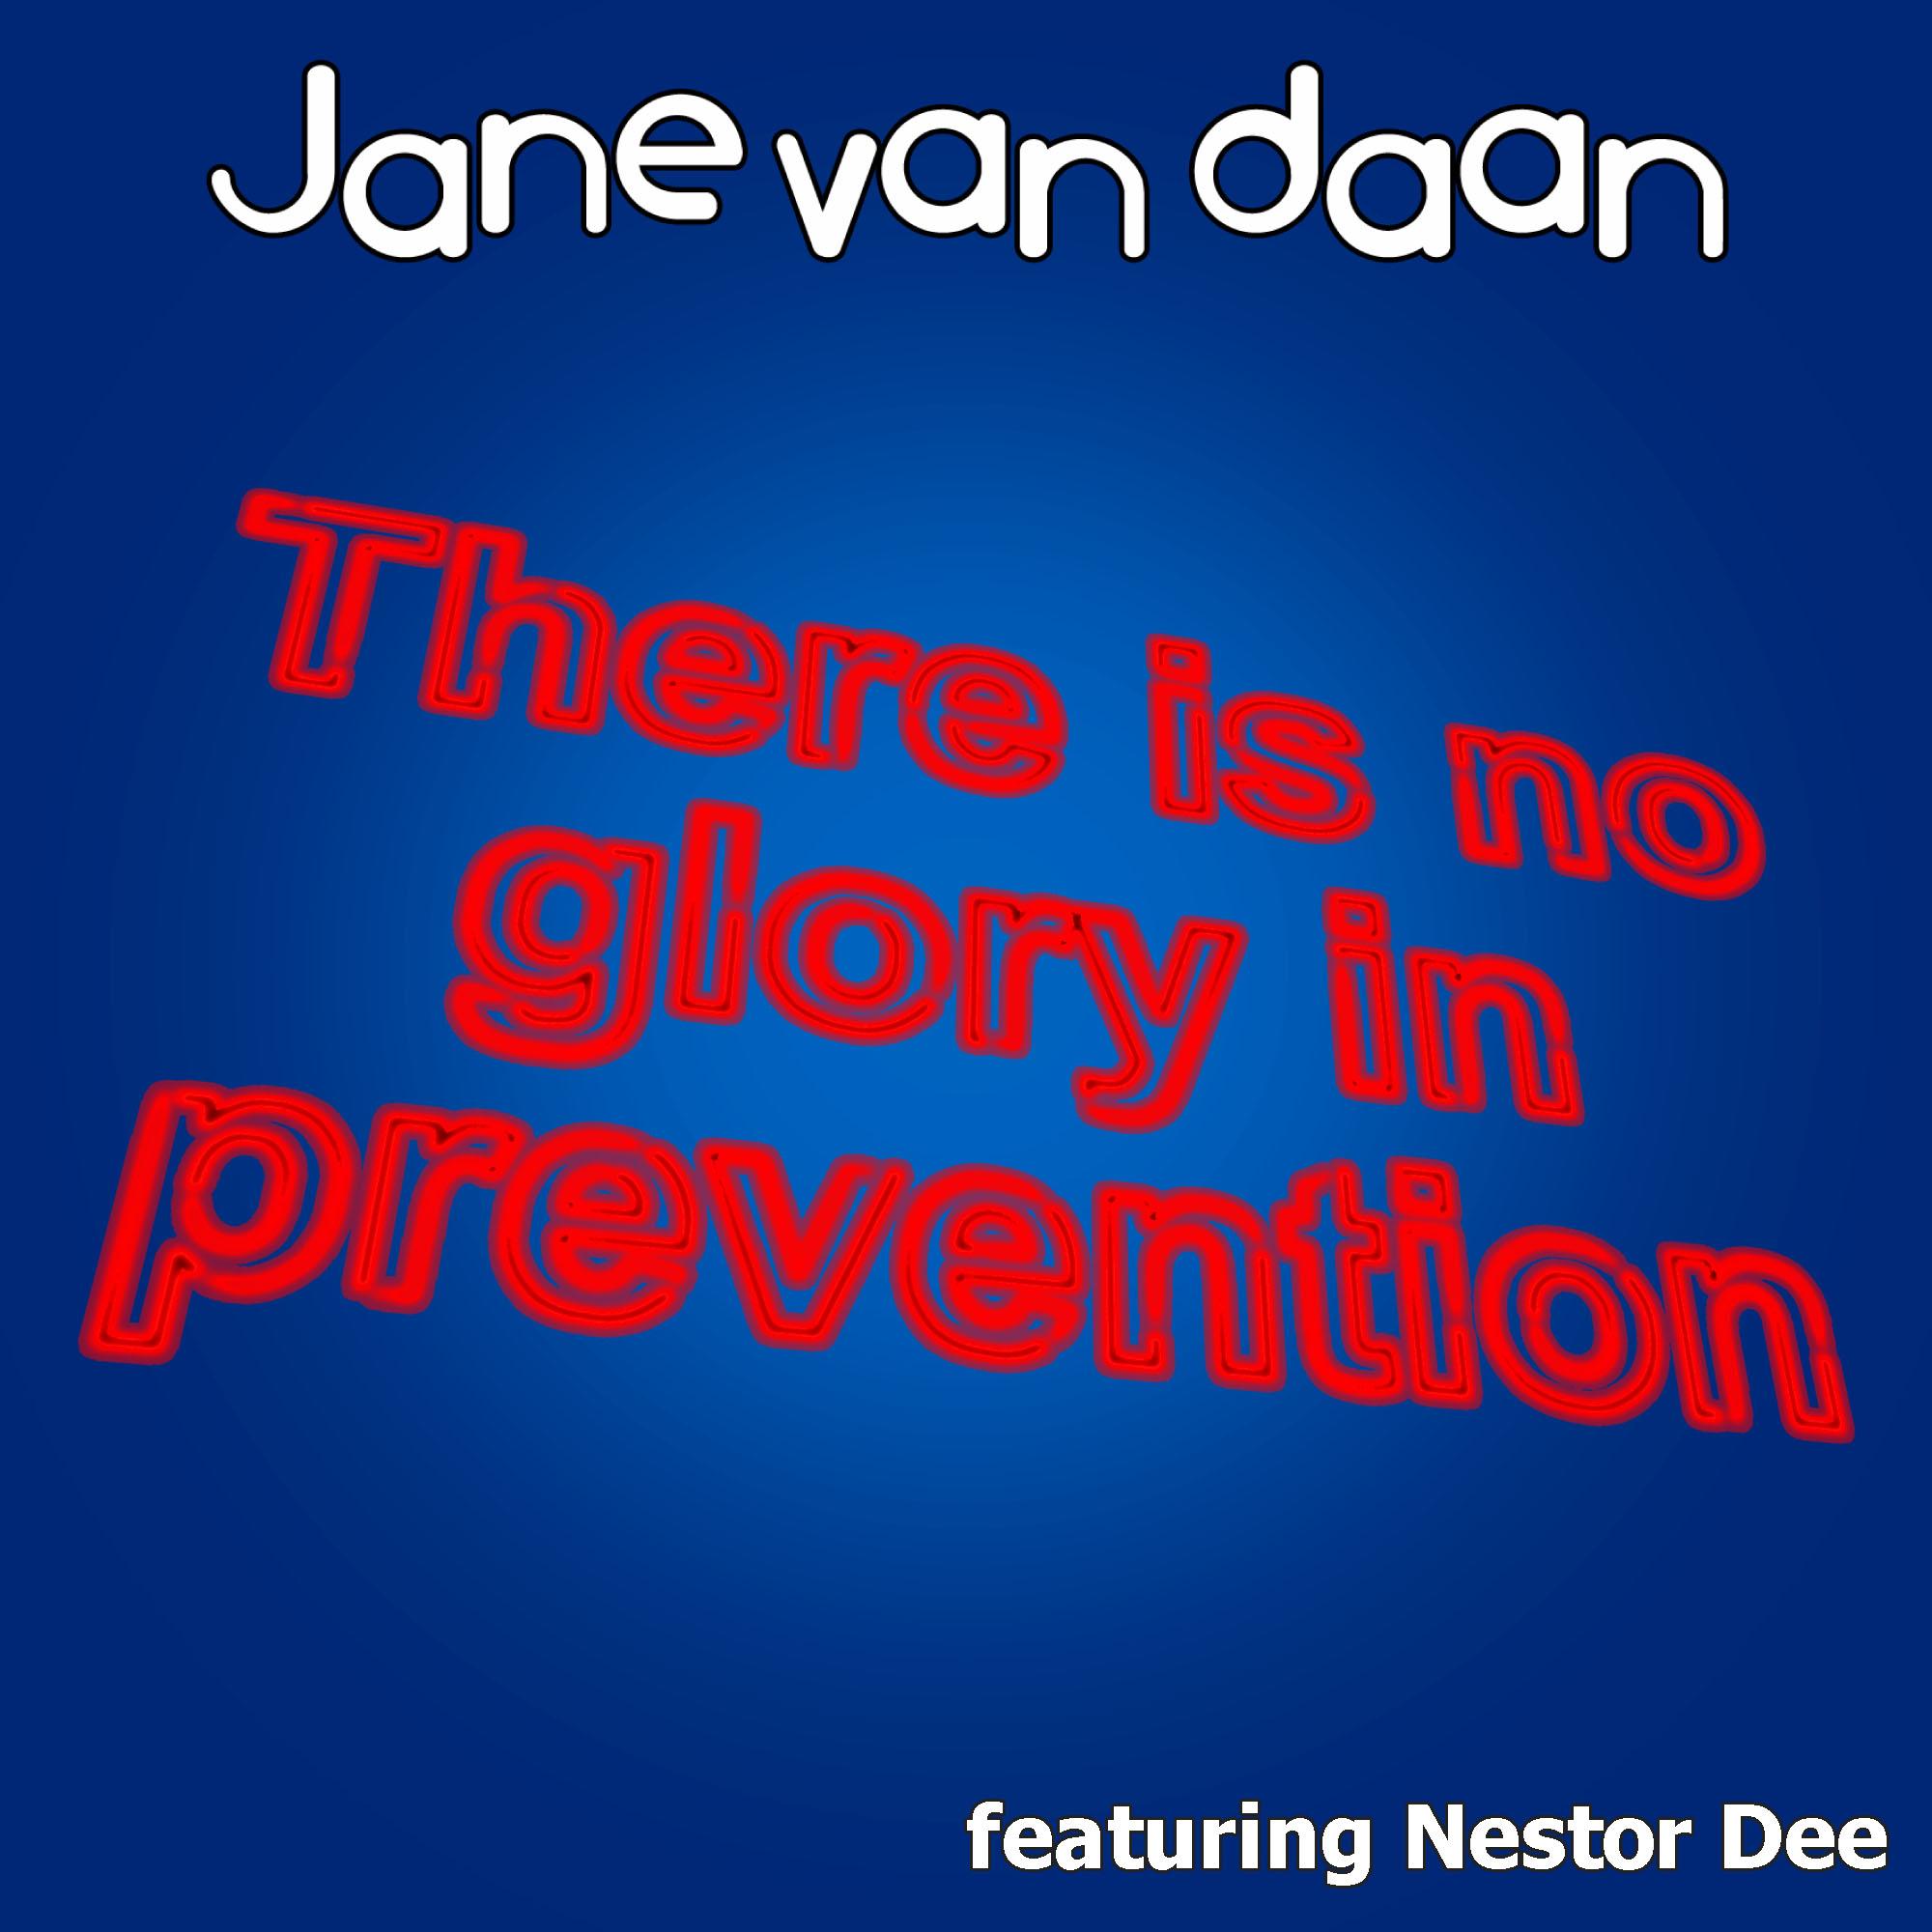 Jane Van Daan - There Is No Glory In Prevention